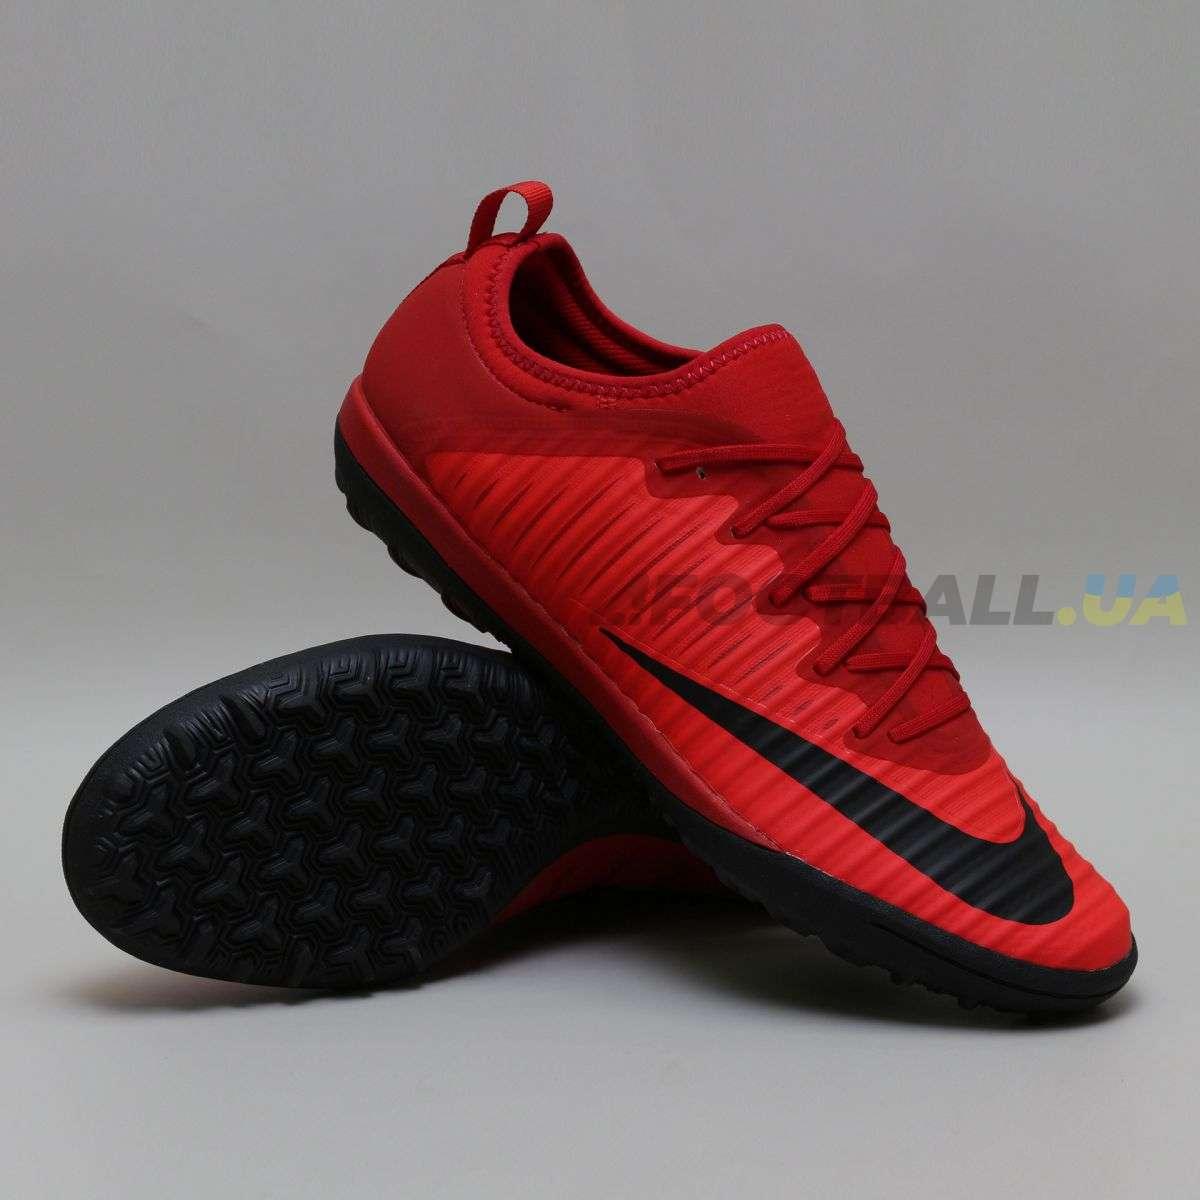 63321fad2db Сороконожки Nike MercurialX Finale II TF 831975-616 RED купить у ...